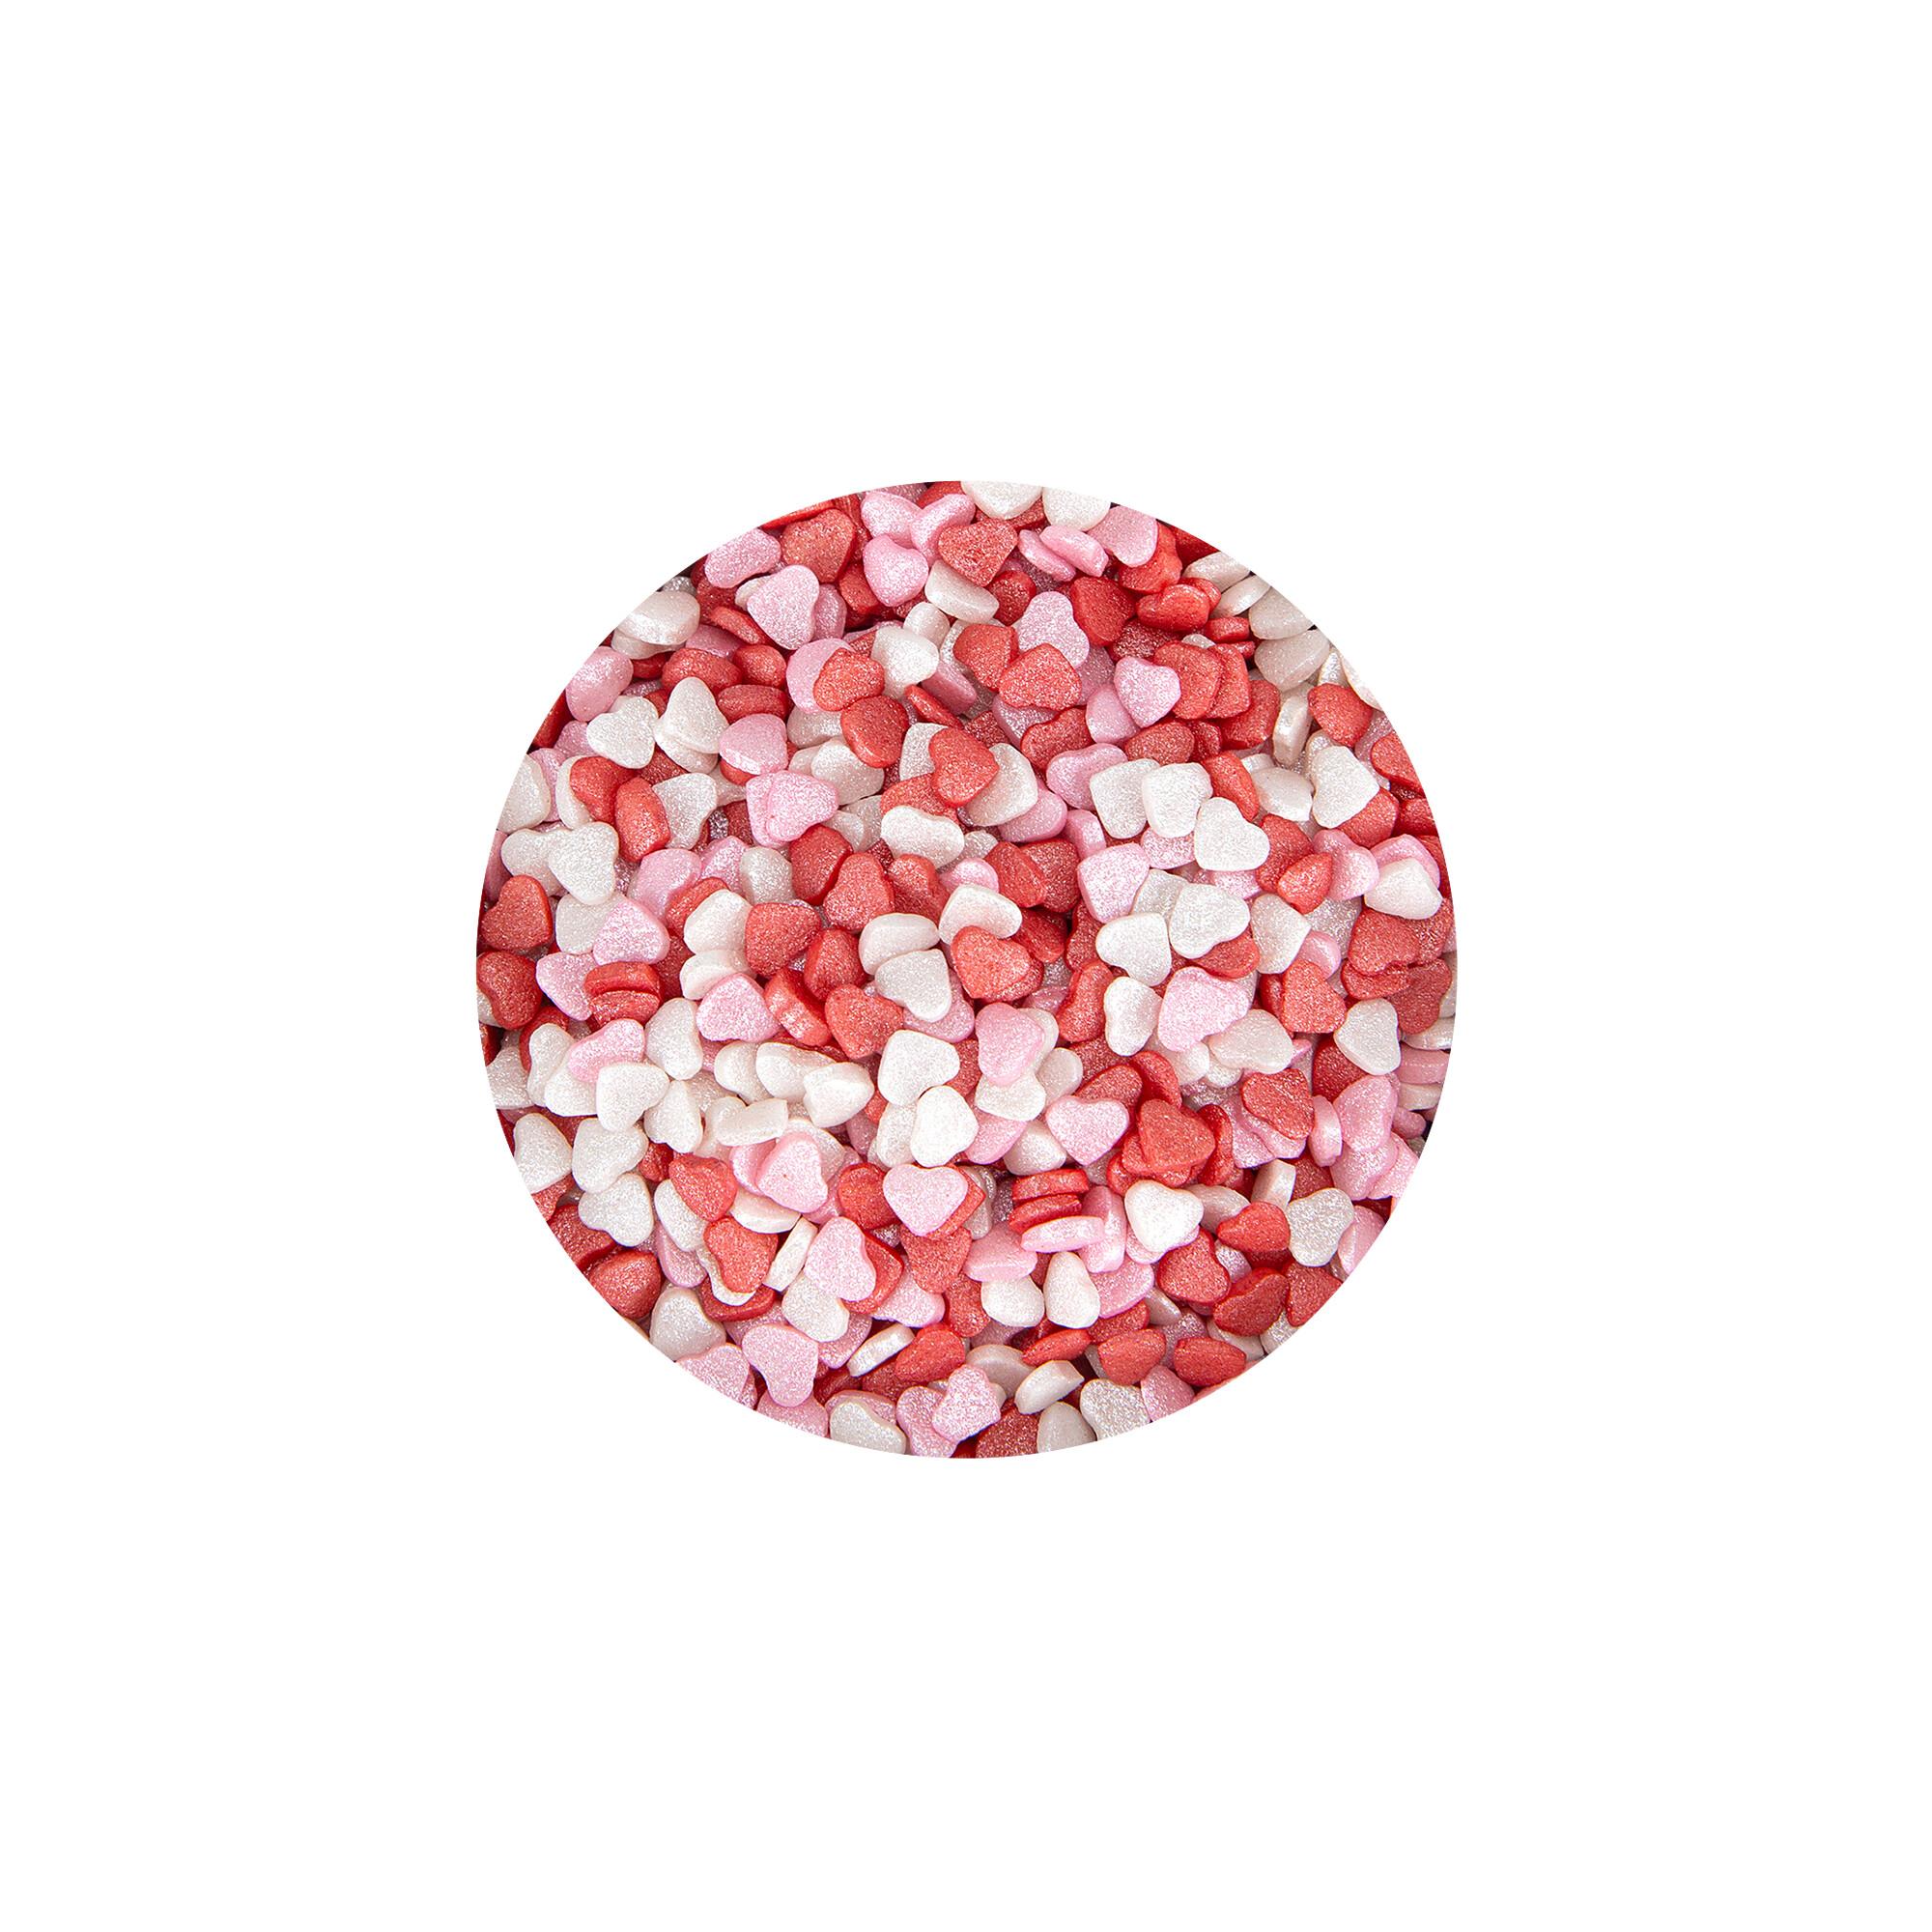 Edible sprinkle decoration - Hearts Mini